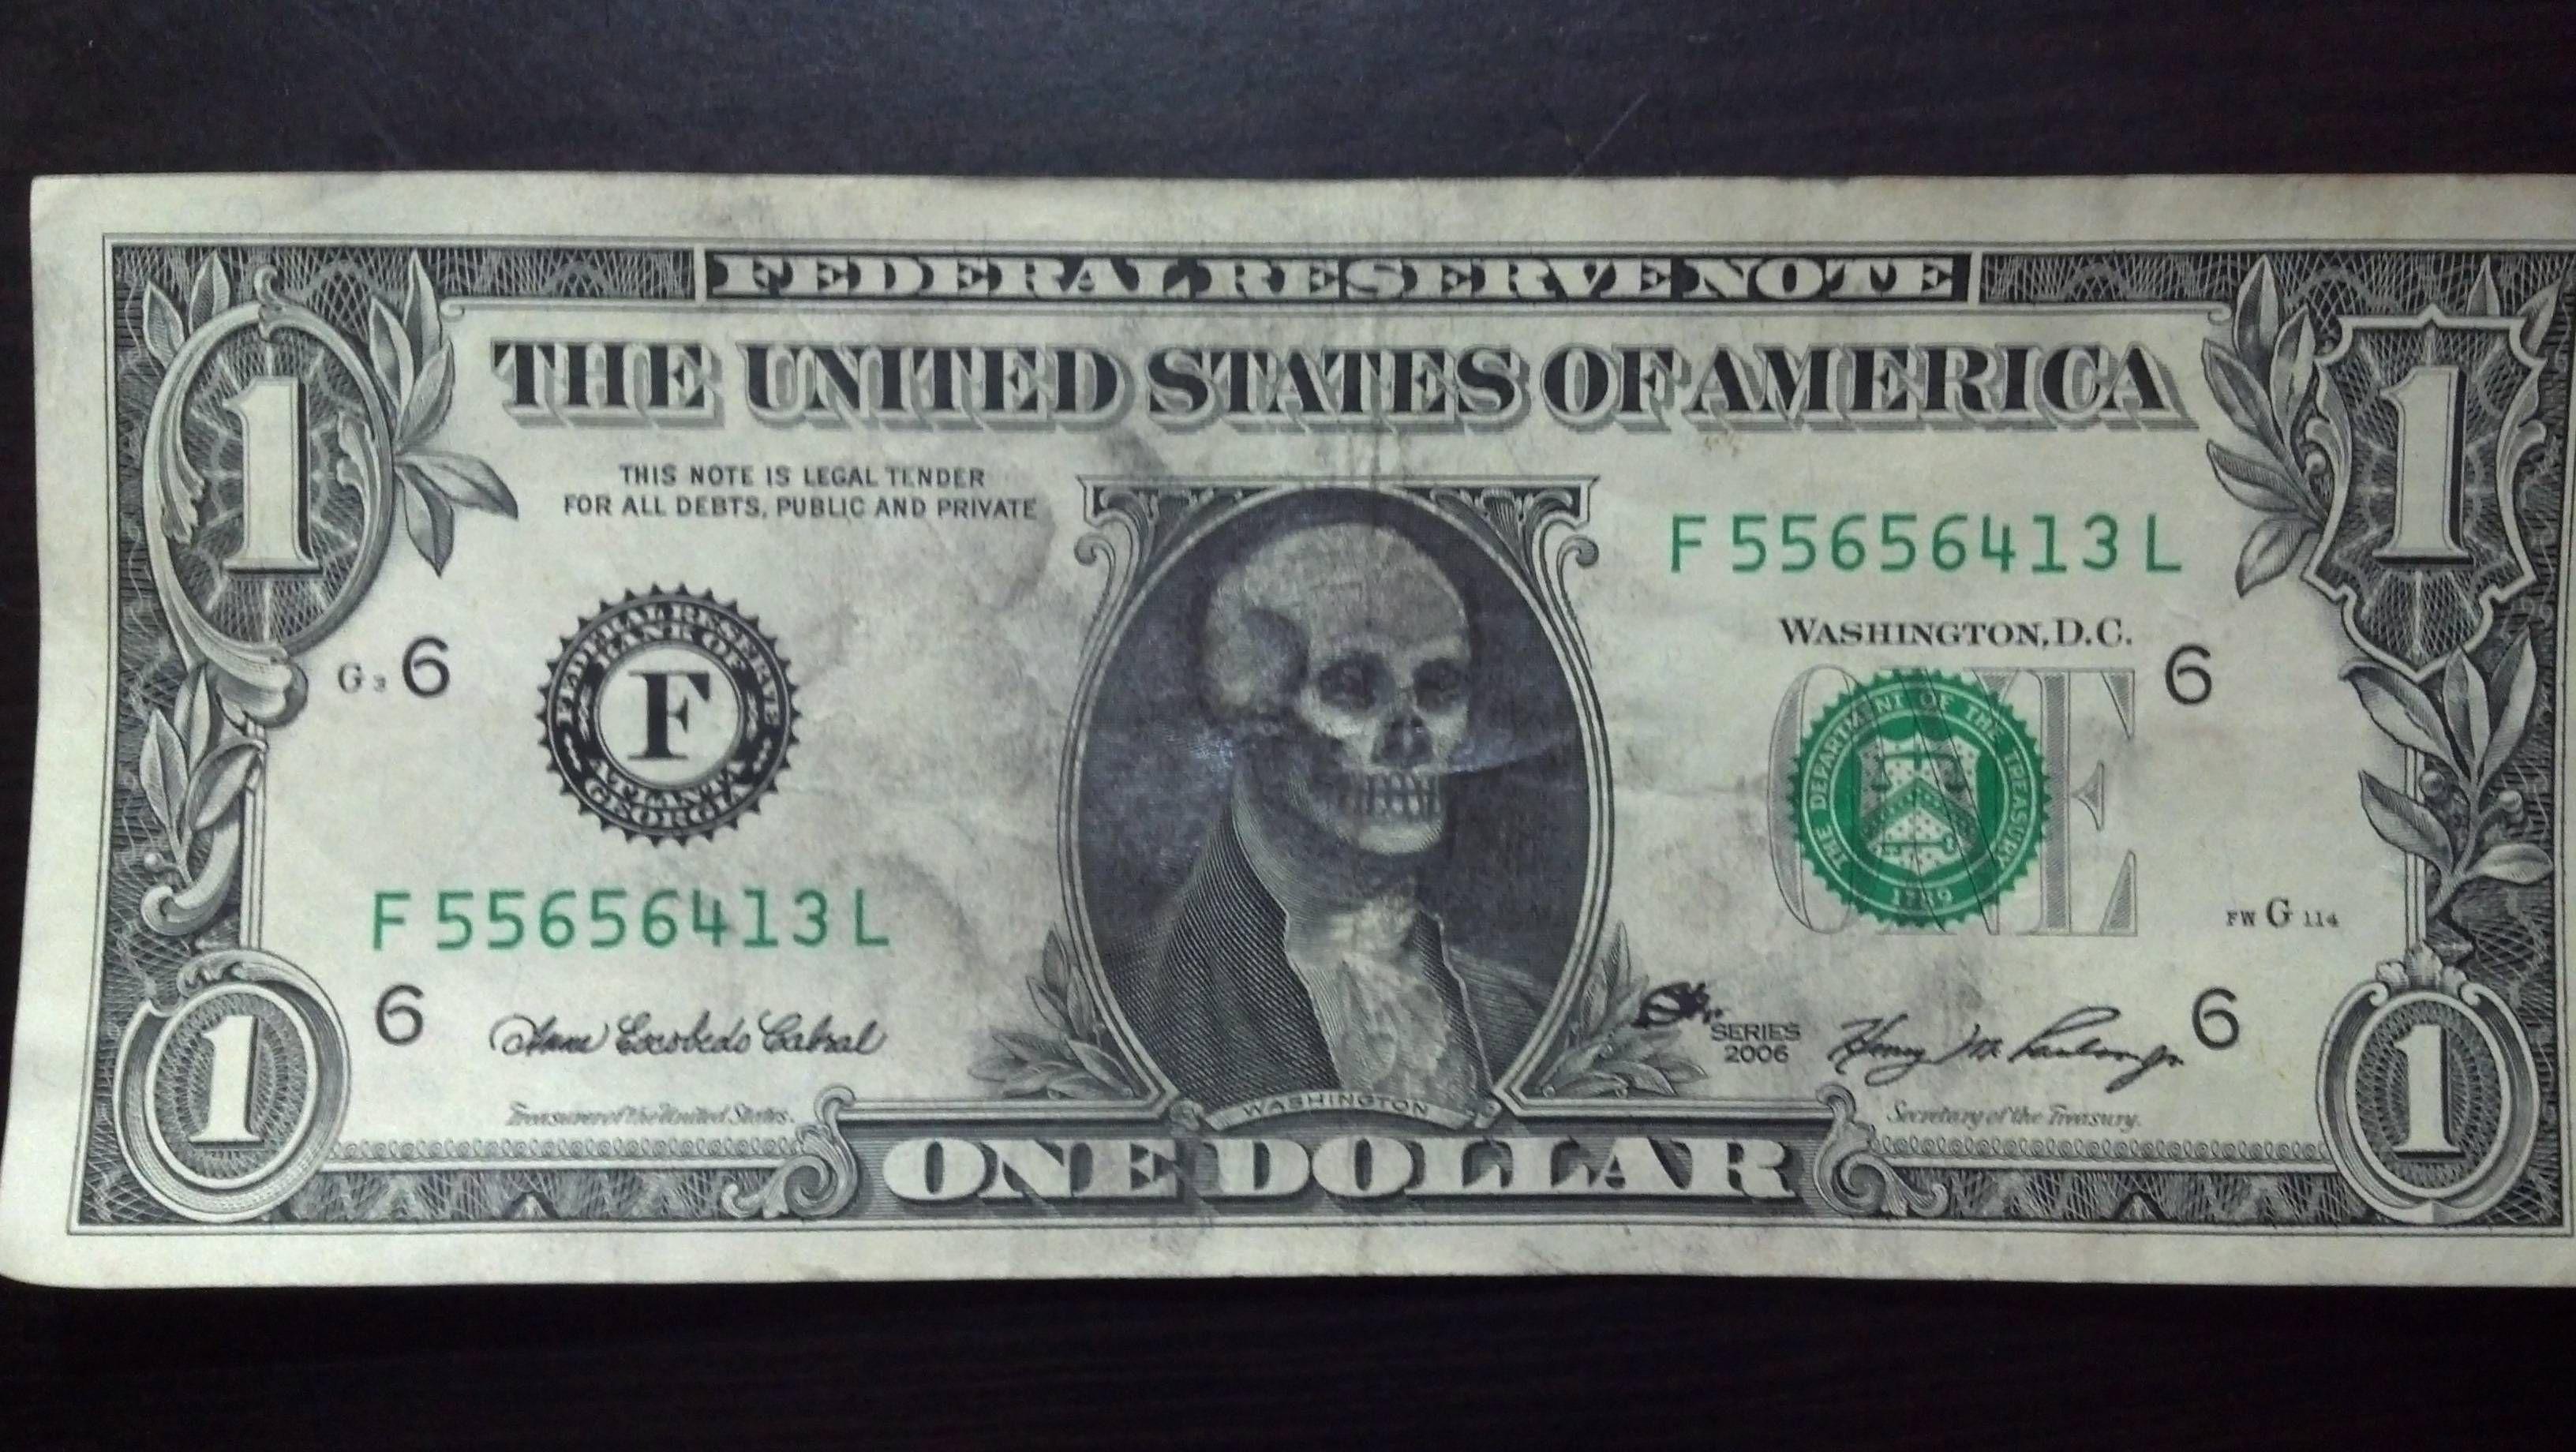 Imaginative Money Graffiti